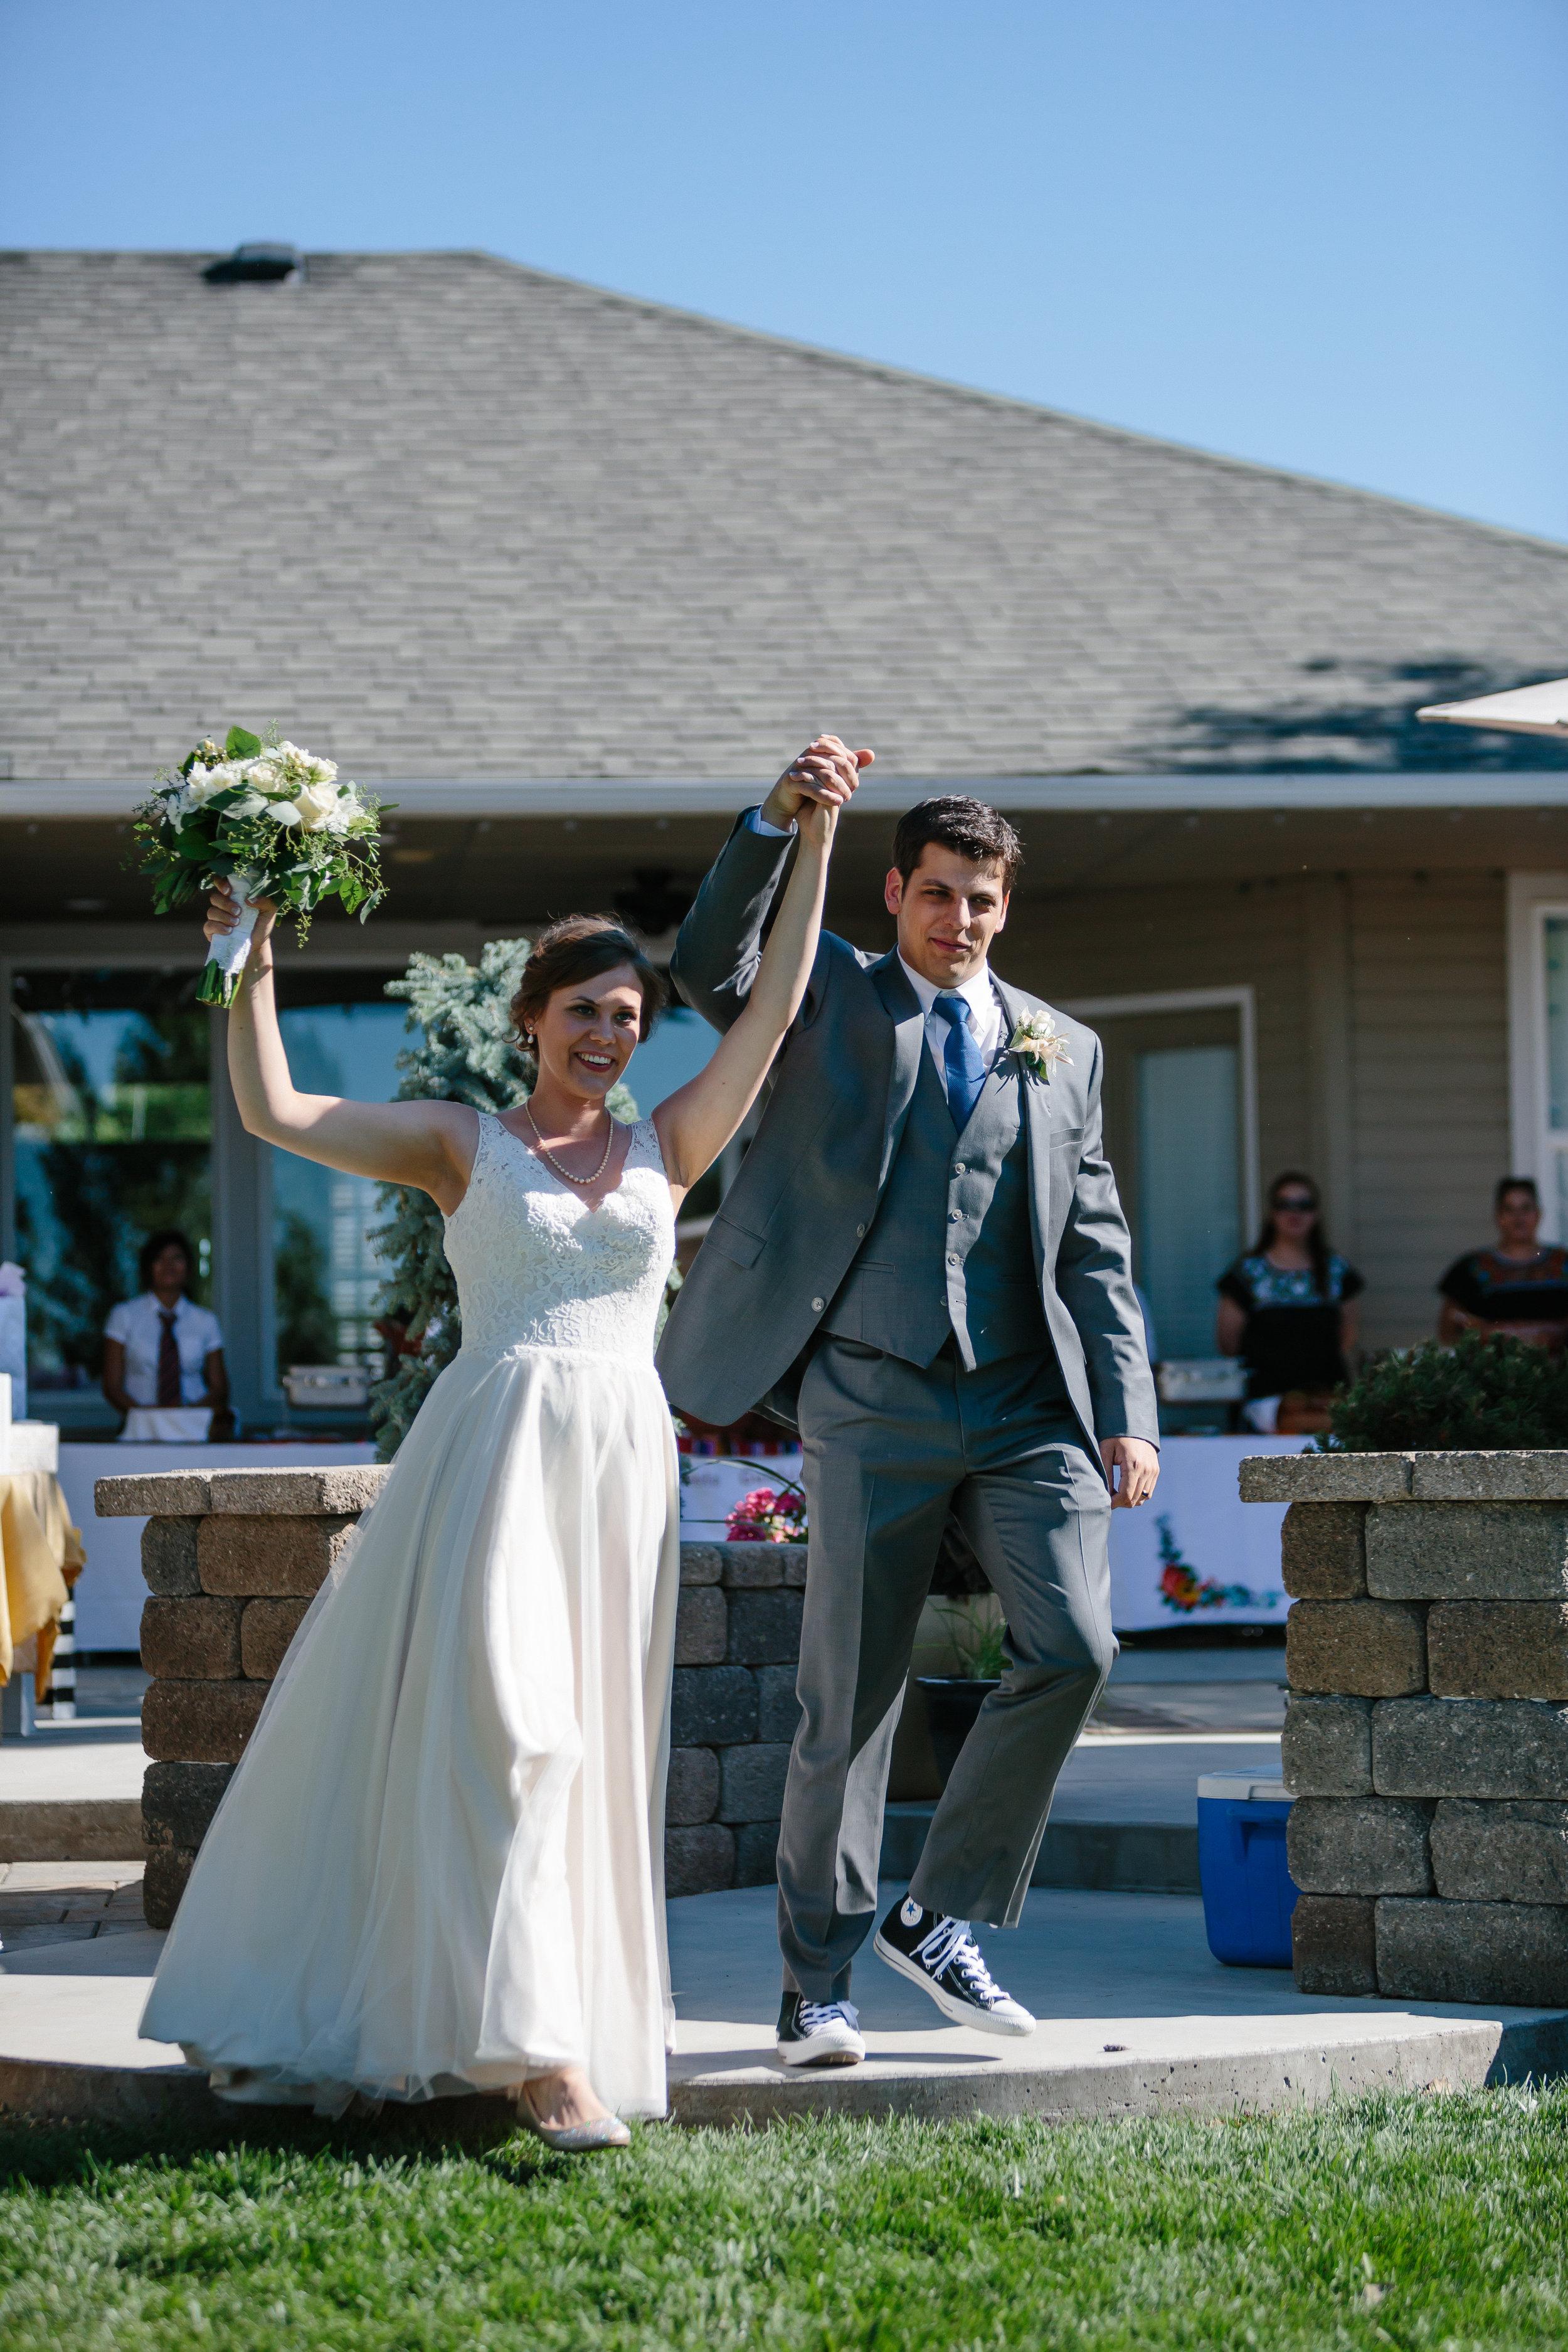 Jordan & Shantel Married - Idaho - Corrie Mick Photography-260.jpg